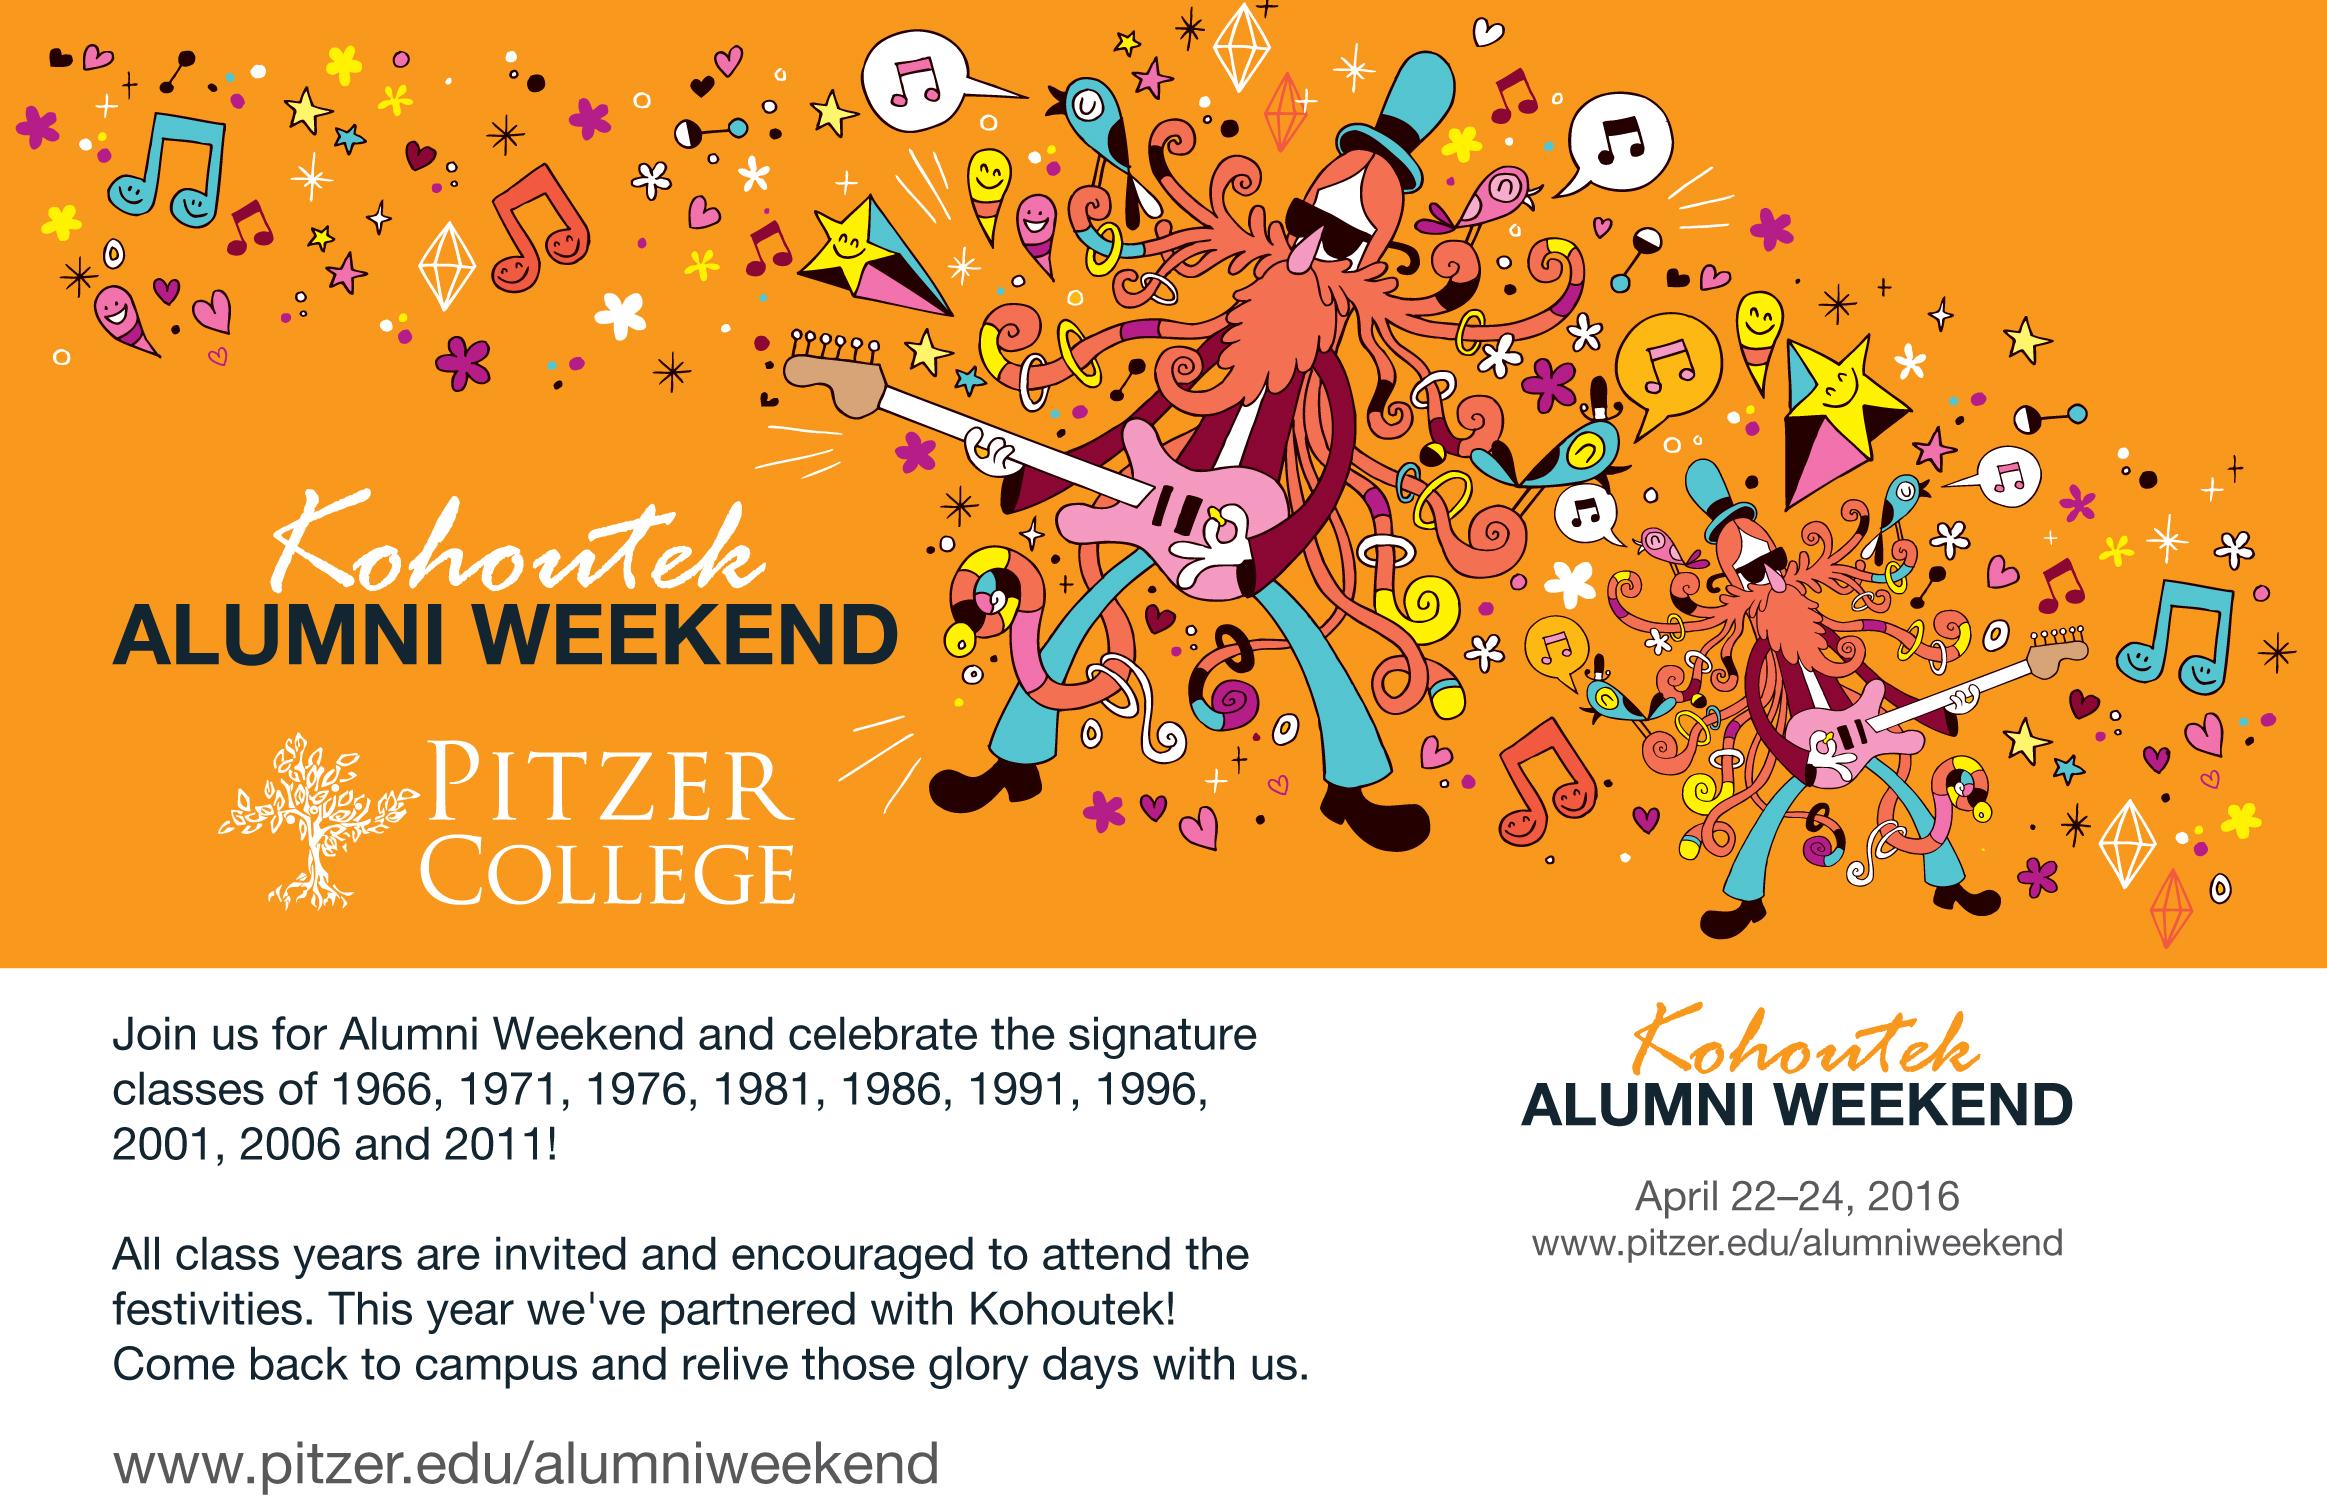 2016 Invitation to Alumni Weekend which took place the same weekend as Kohoutek.